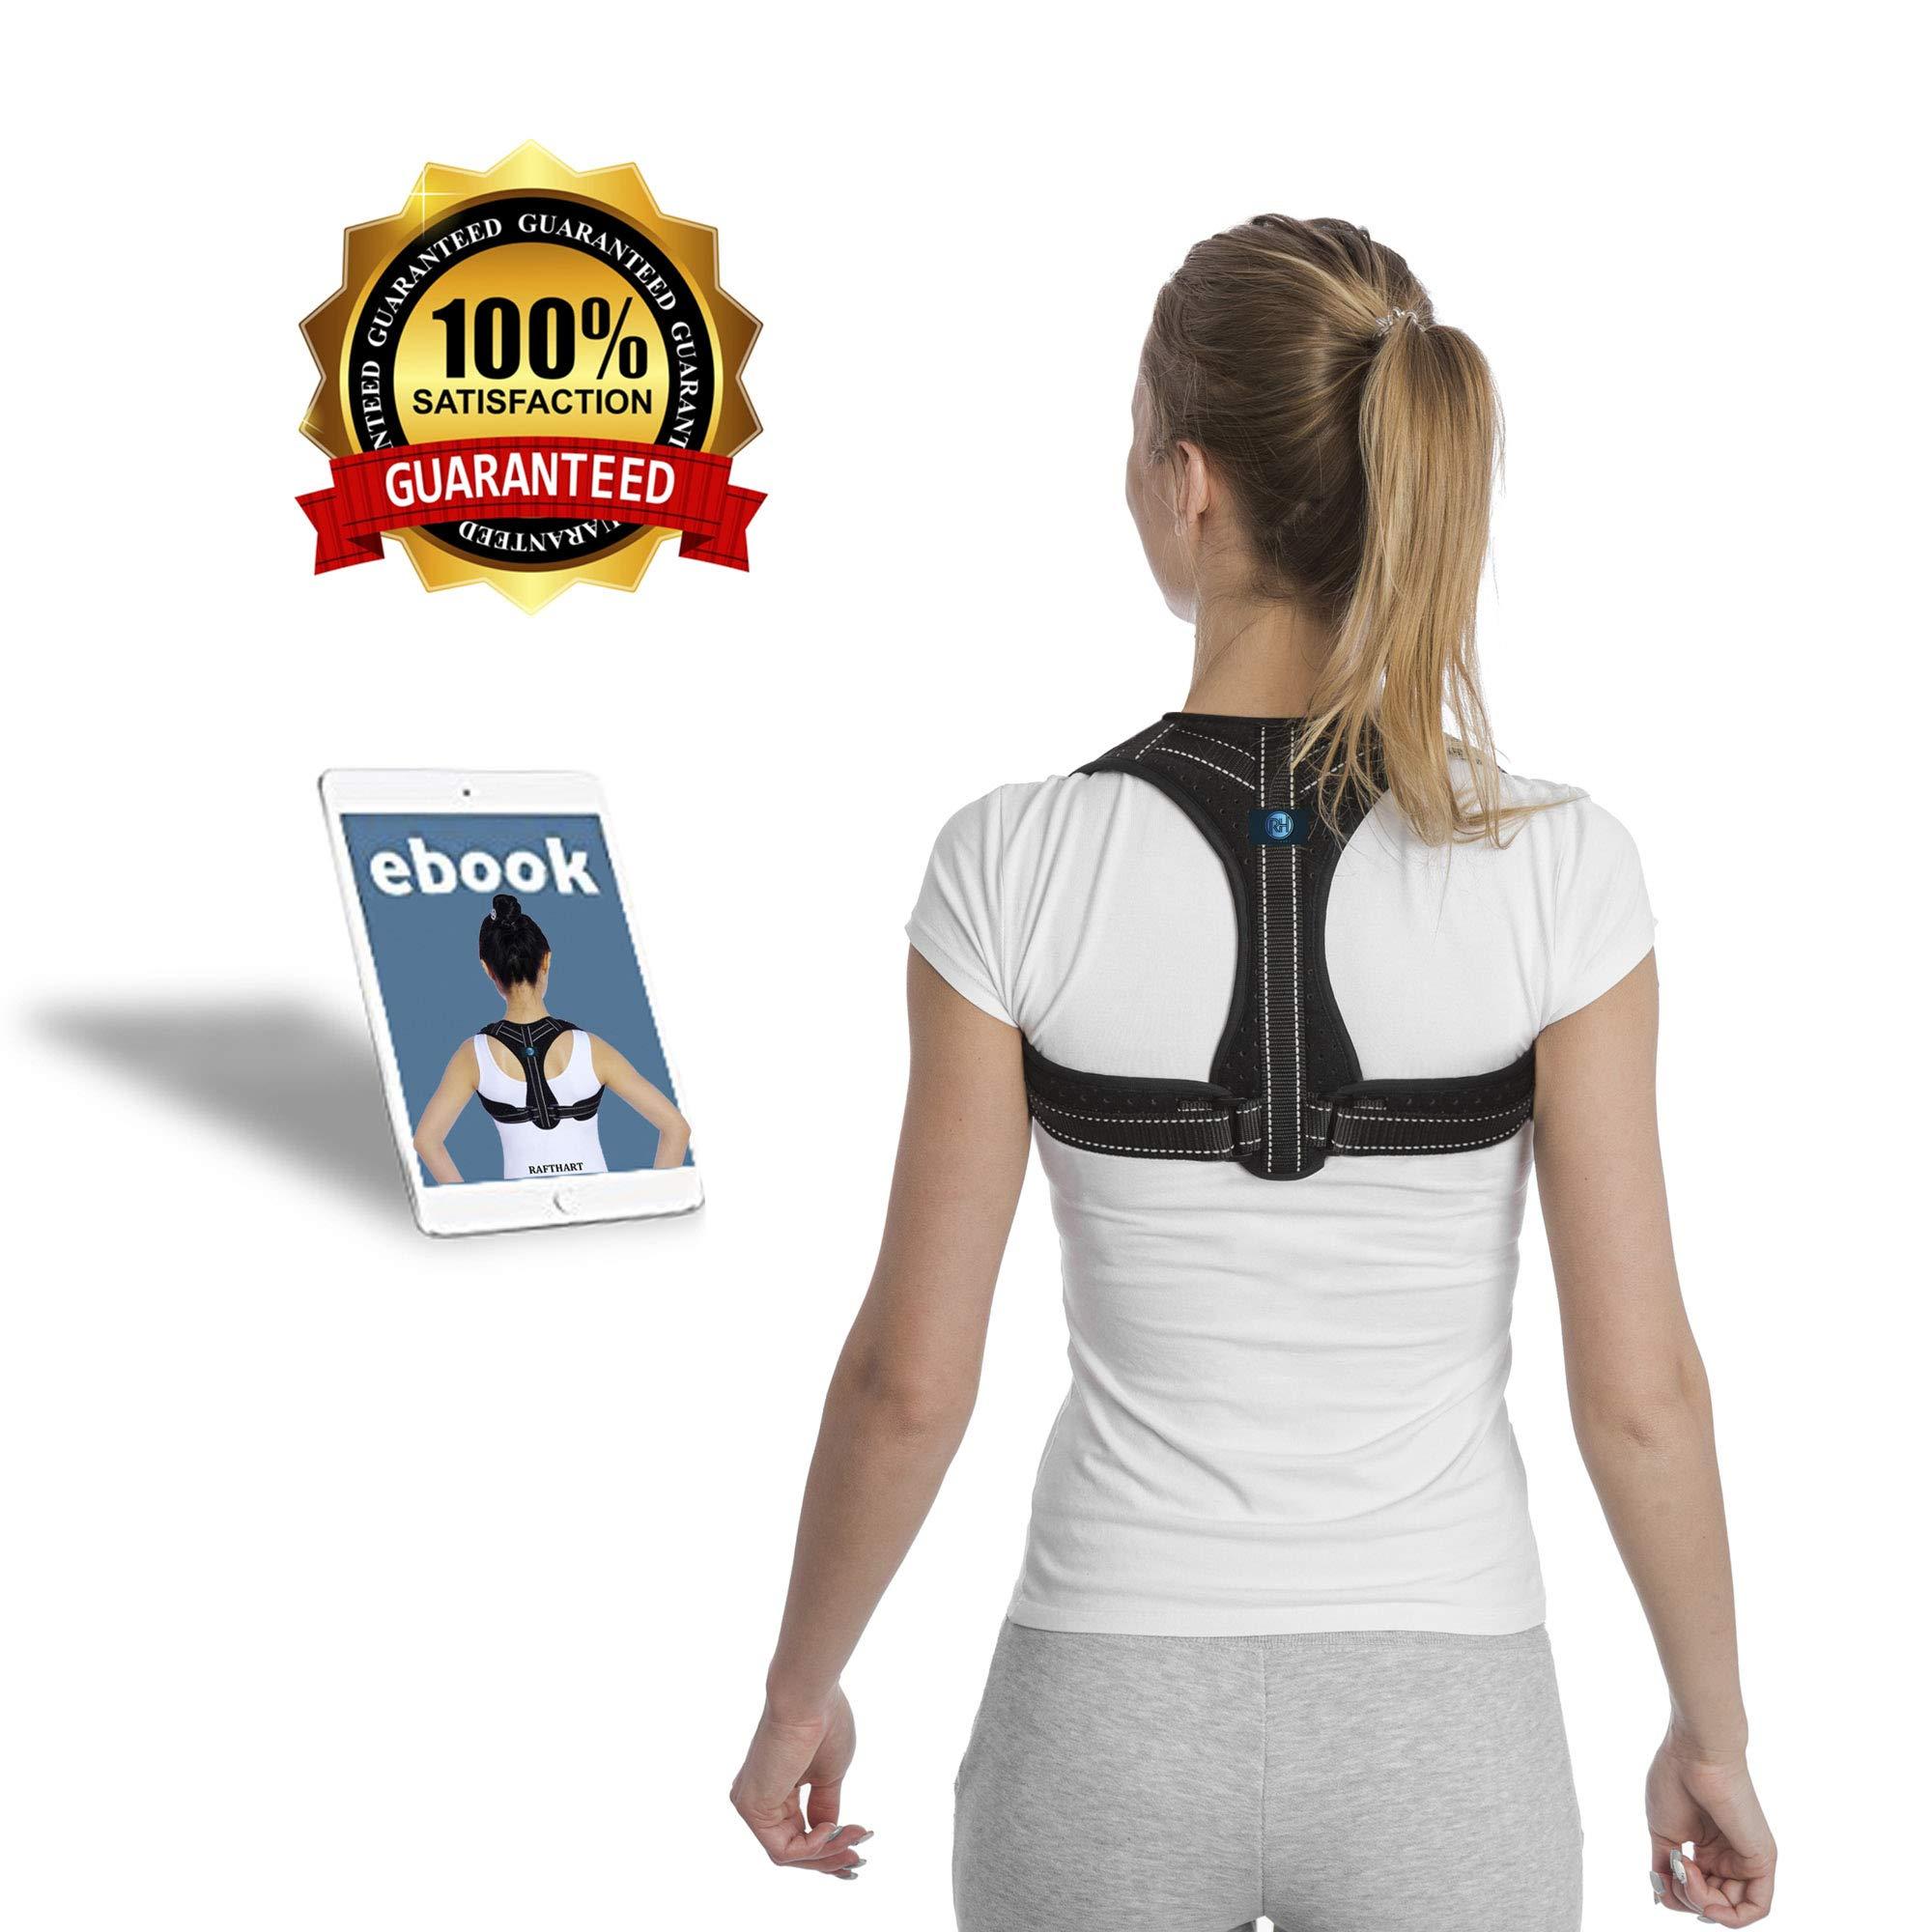 Back Posture Corrector for Women & Men | Enhances Posture & Relieves Back & Neck Pain| Best Fully Adjustable Posture Brace | Upper Back Straightener for Slouching & Hunching| Subtle Comfortable Design